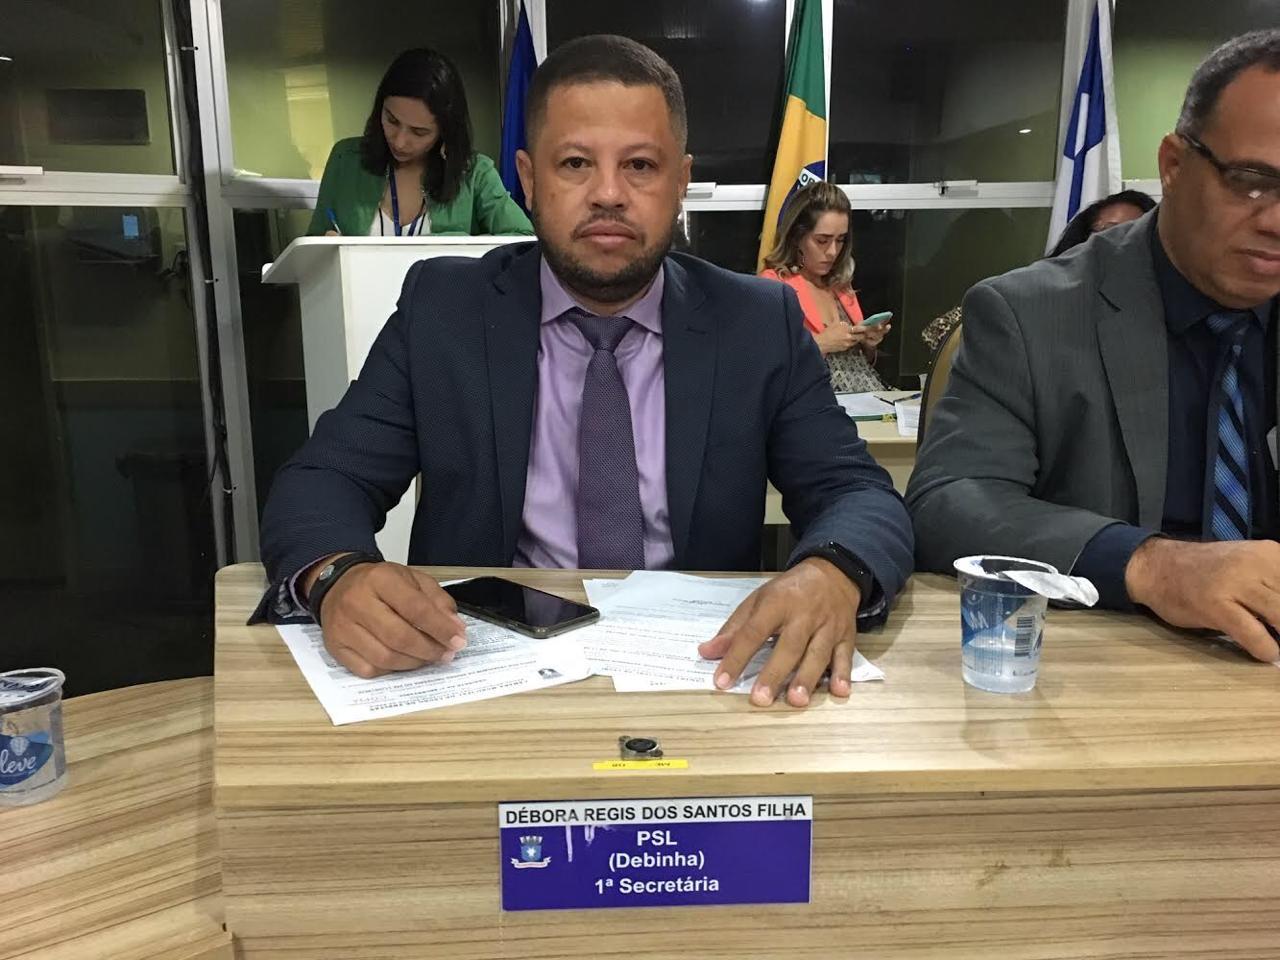 Vereador Decinho apresenta PL que programa semáforos com sinal de alerta intermitente